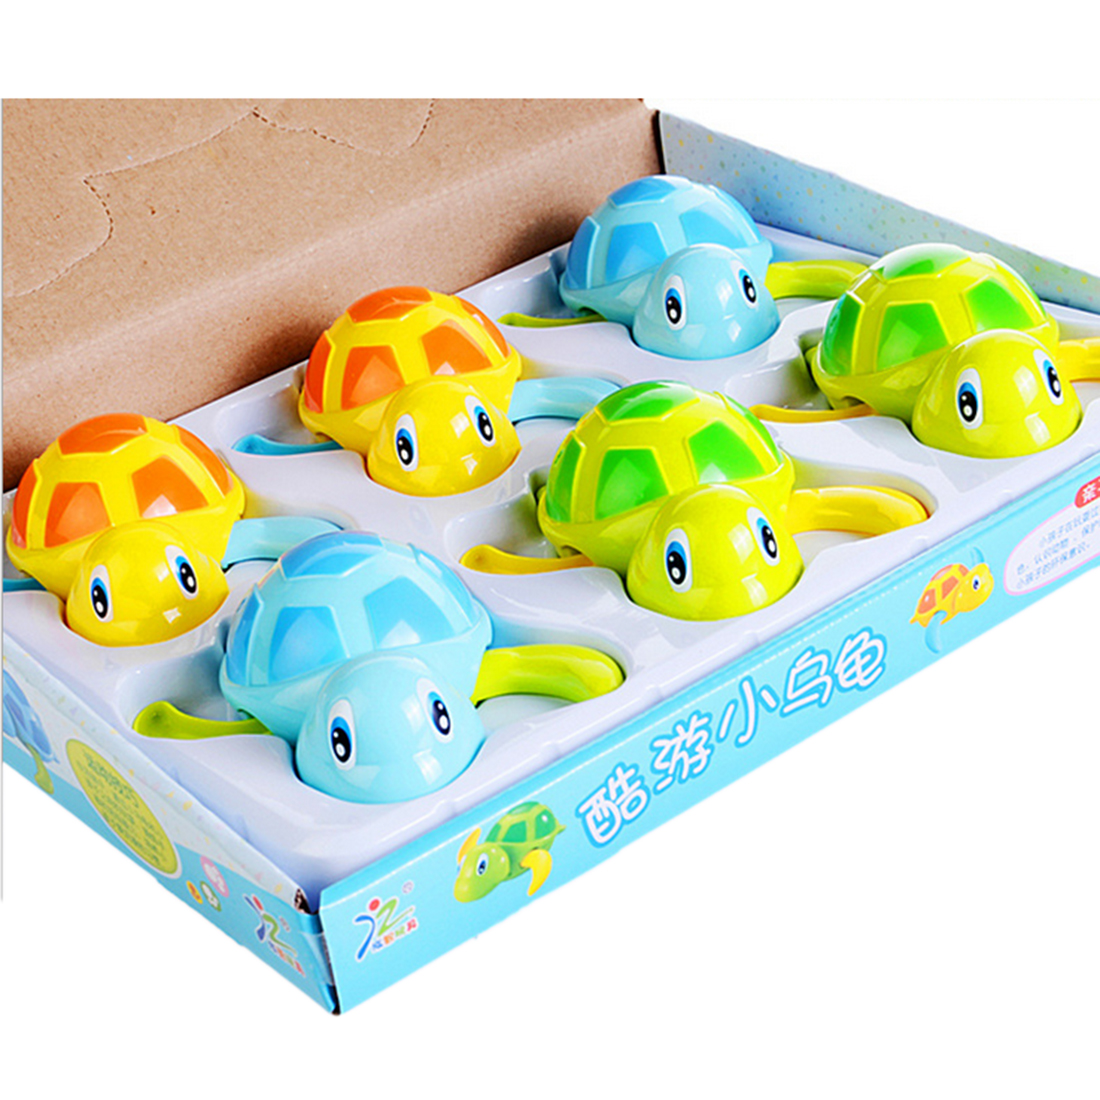 6Pcs Kids Bath Toys Swimming Turtles Bathtub Toys Floating Bath Toy ...